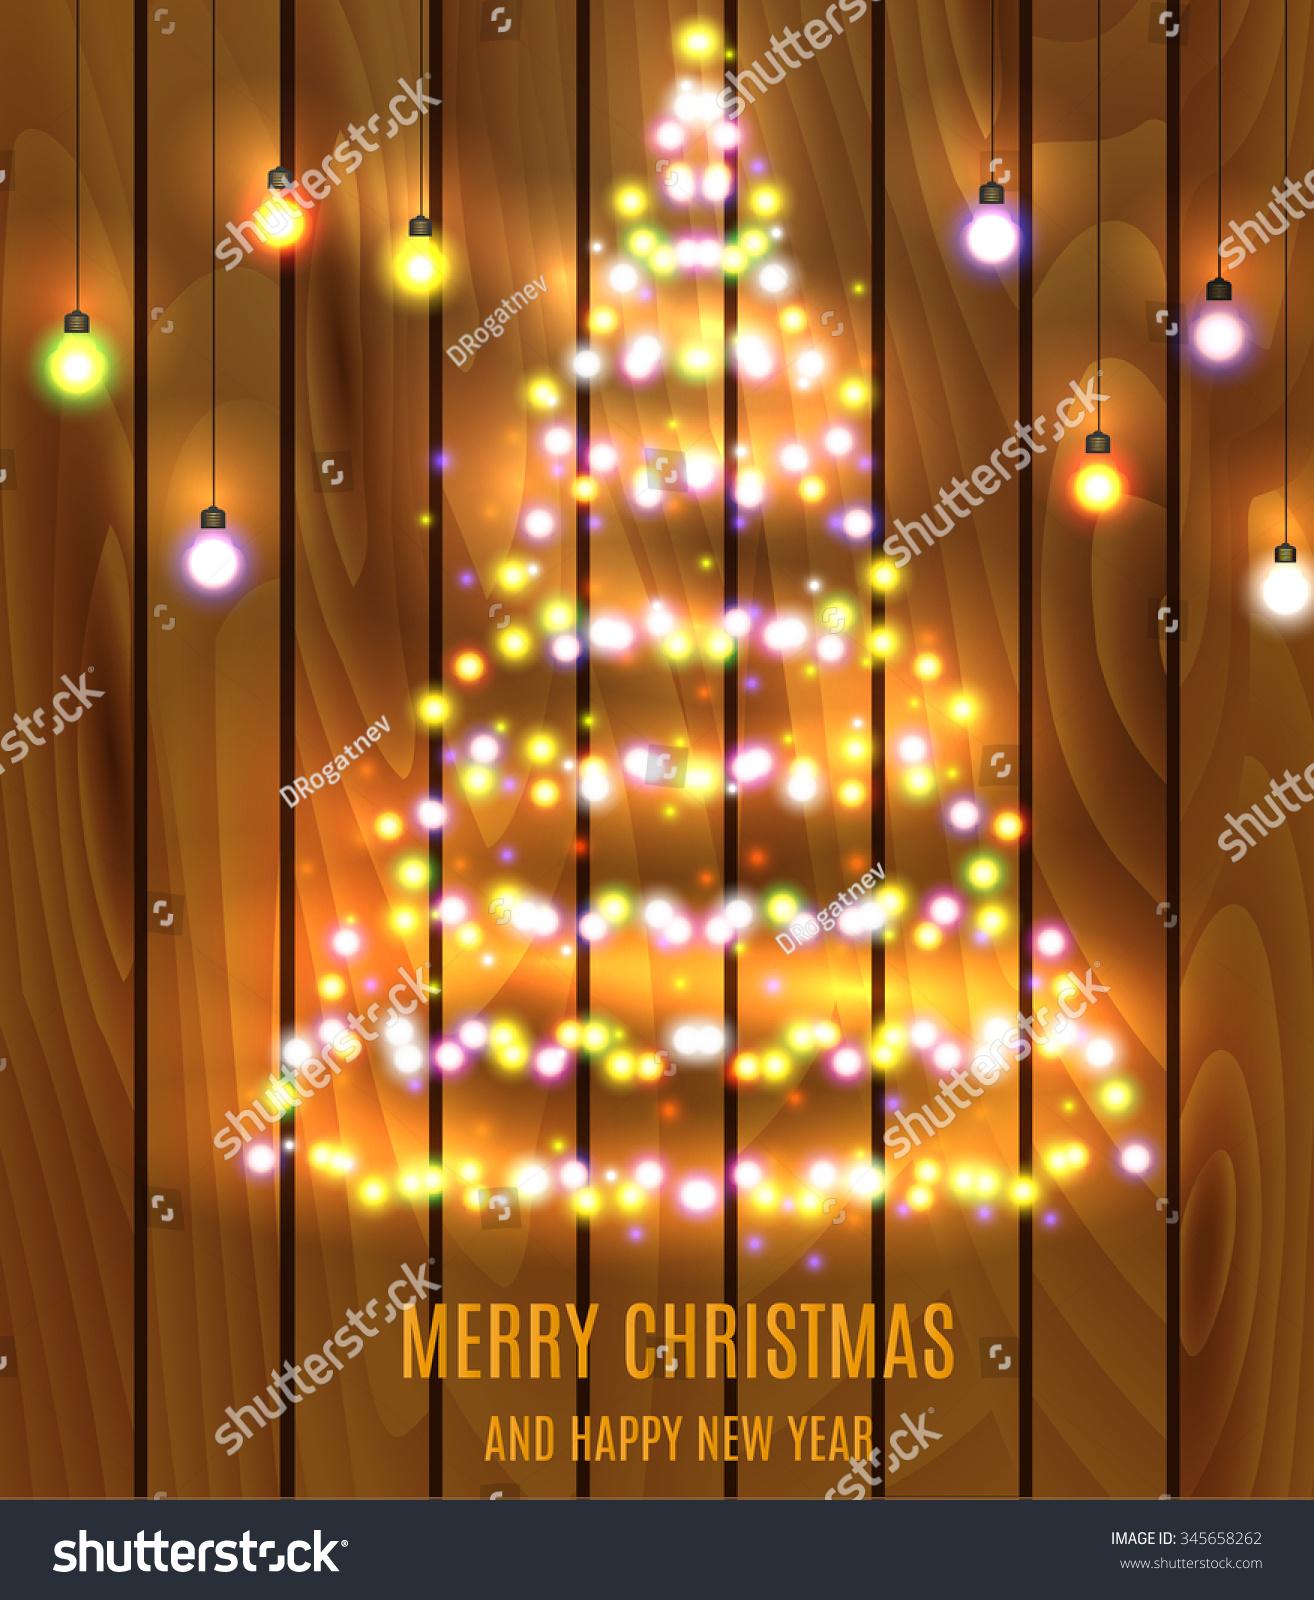 Christmas Tree Made Christmas Lights Illustration Stock Illustration